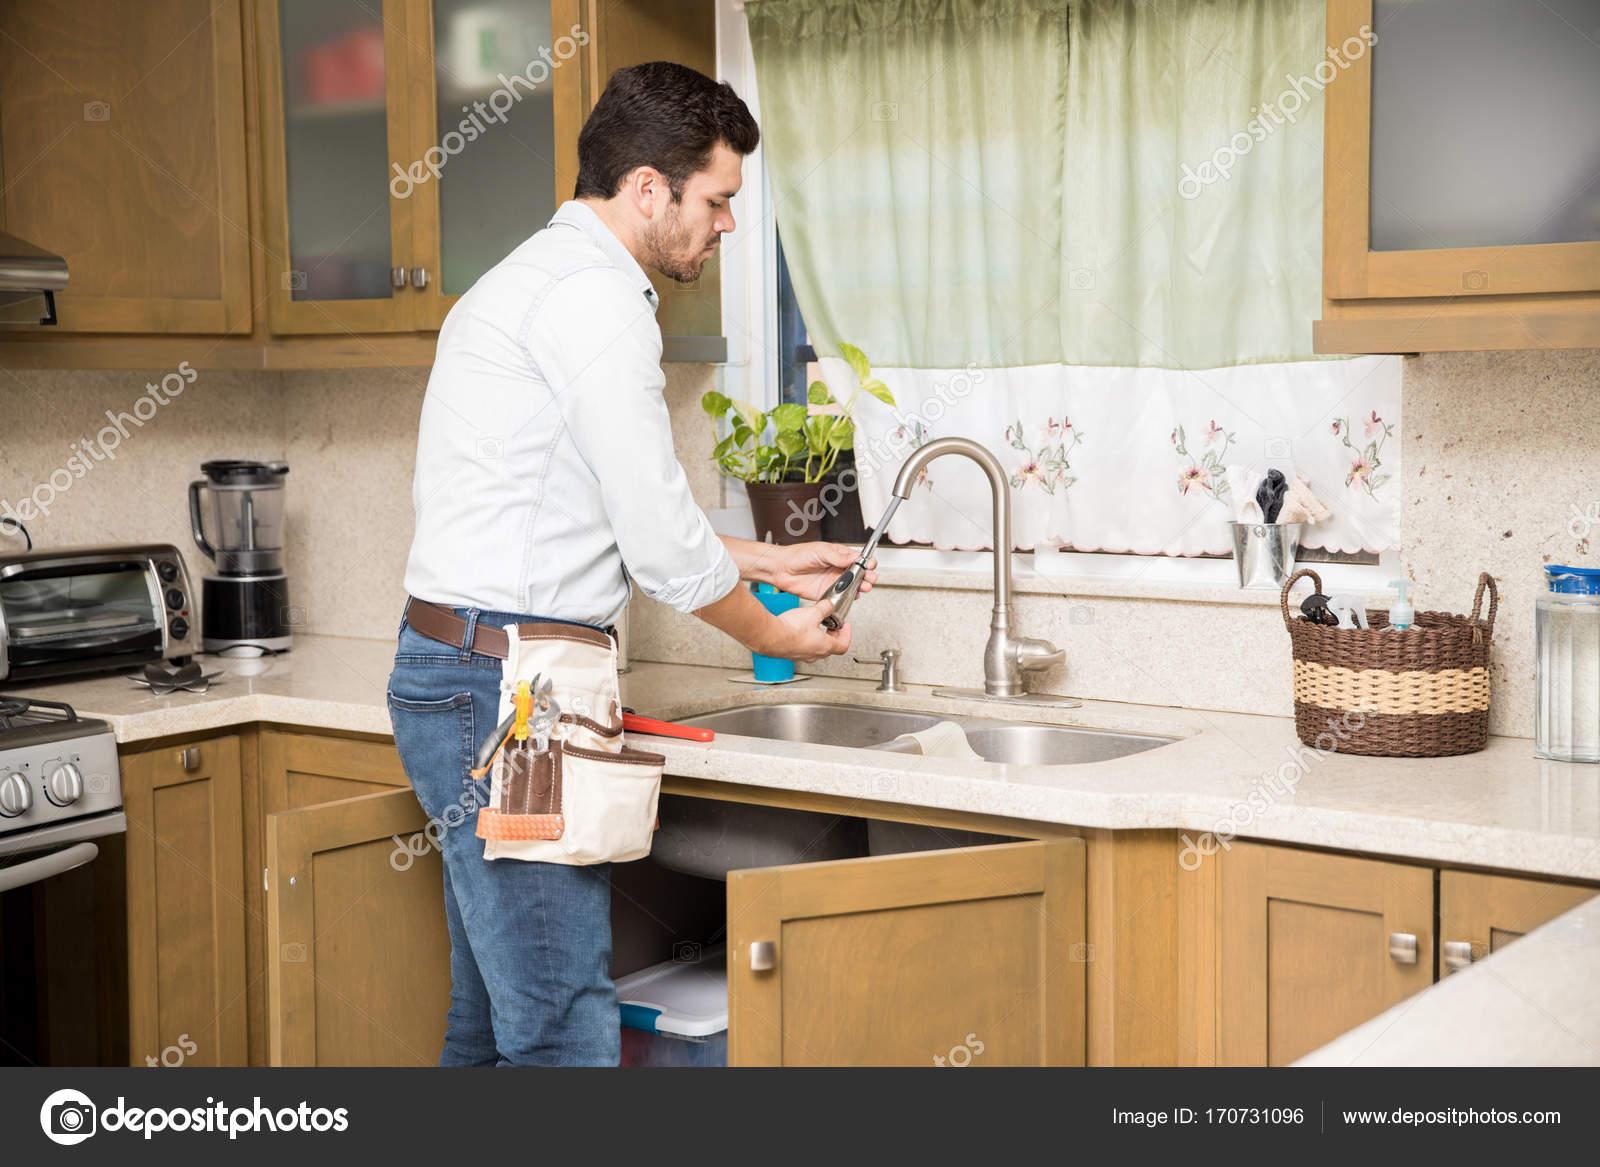 Mann eine Küchenarmatur Reparatur — Stockfoto © tonodiaz #170731096